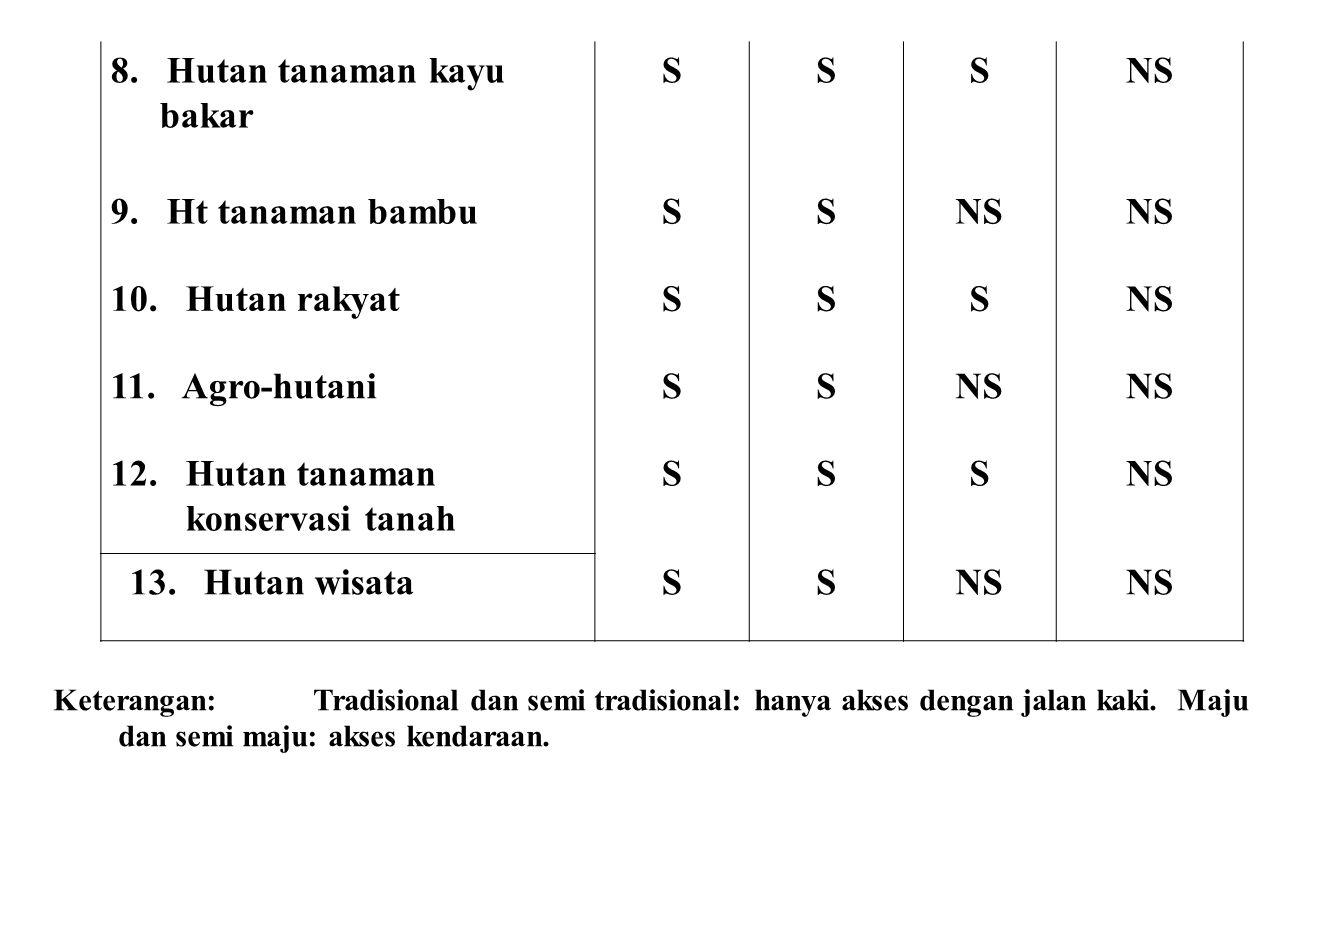 8. Hutan tanaman kayu bakar S NS